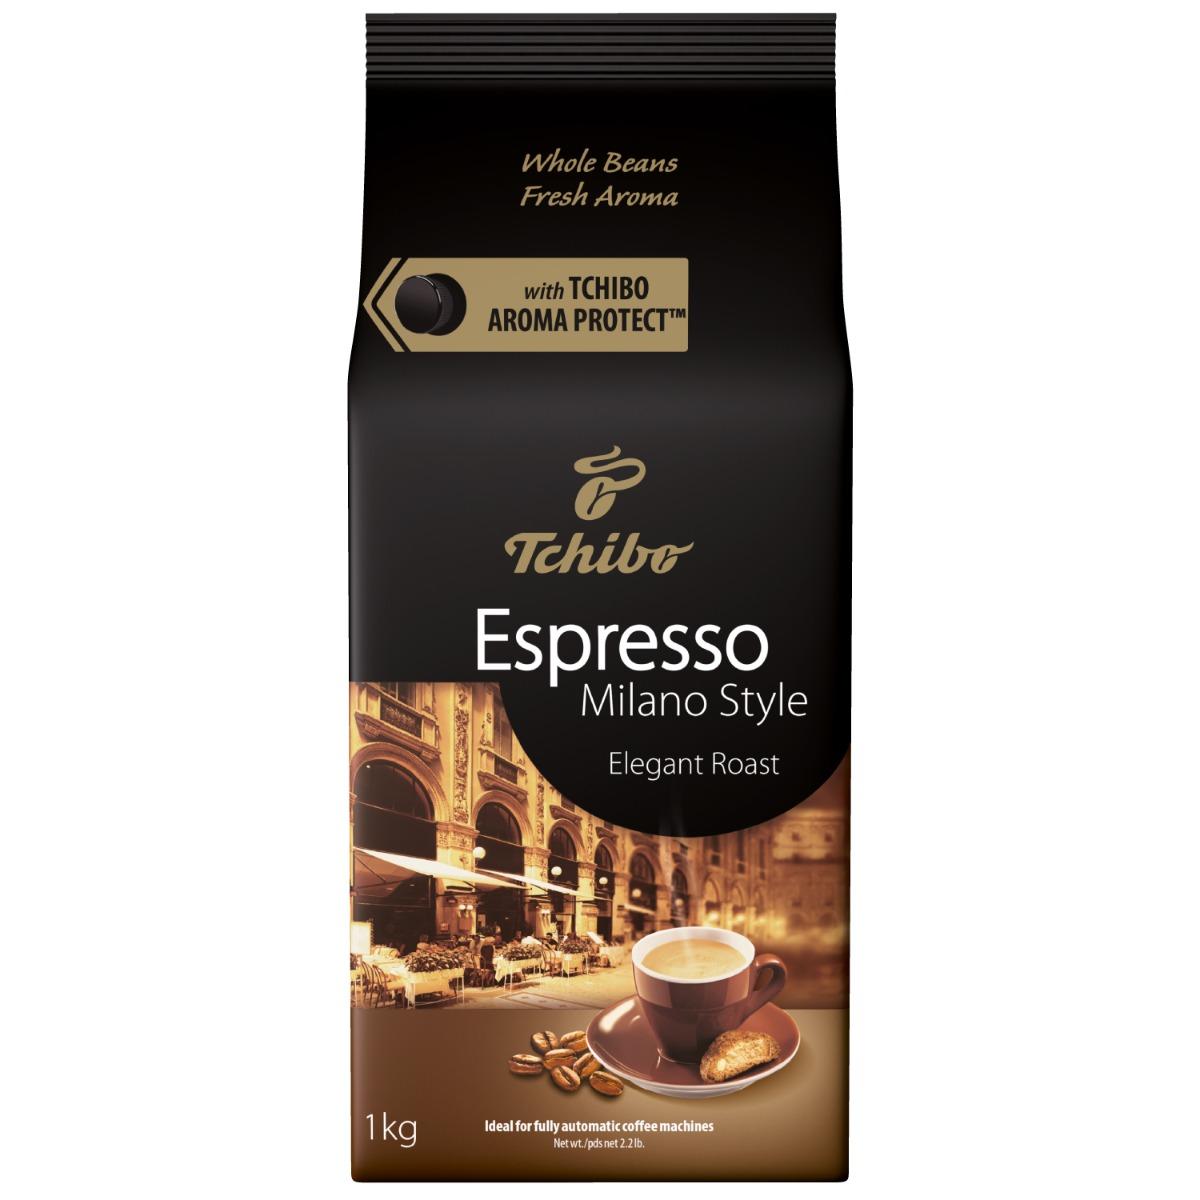 Cafea prajita boabe Tchibo Espresso Milano Style, 1 kg imagine